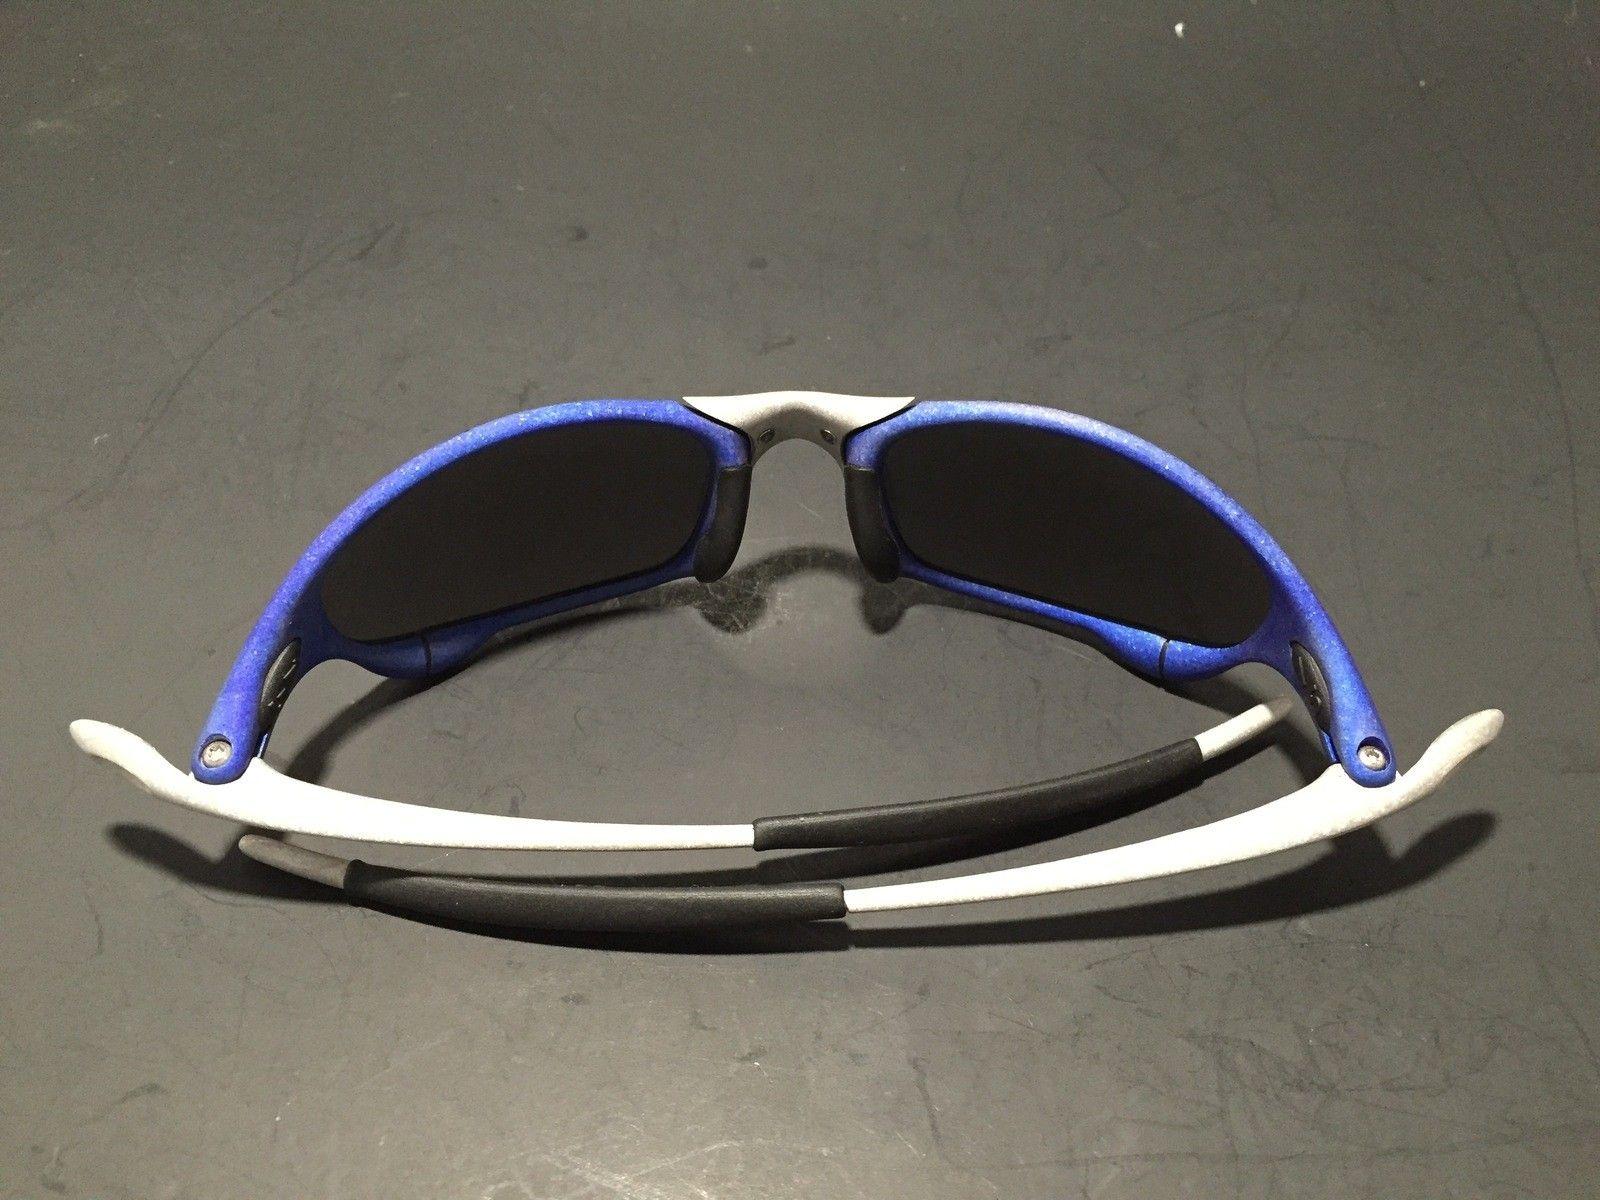 Anodized Juliet Dallas Cowboys colors Blue/Silver w/ OEM Ice Lenses - IMG_1781.JPG